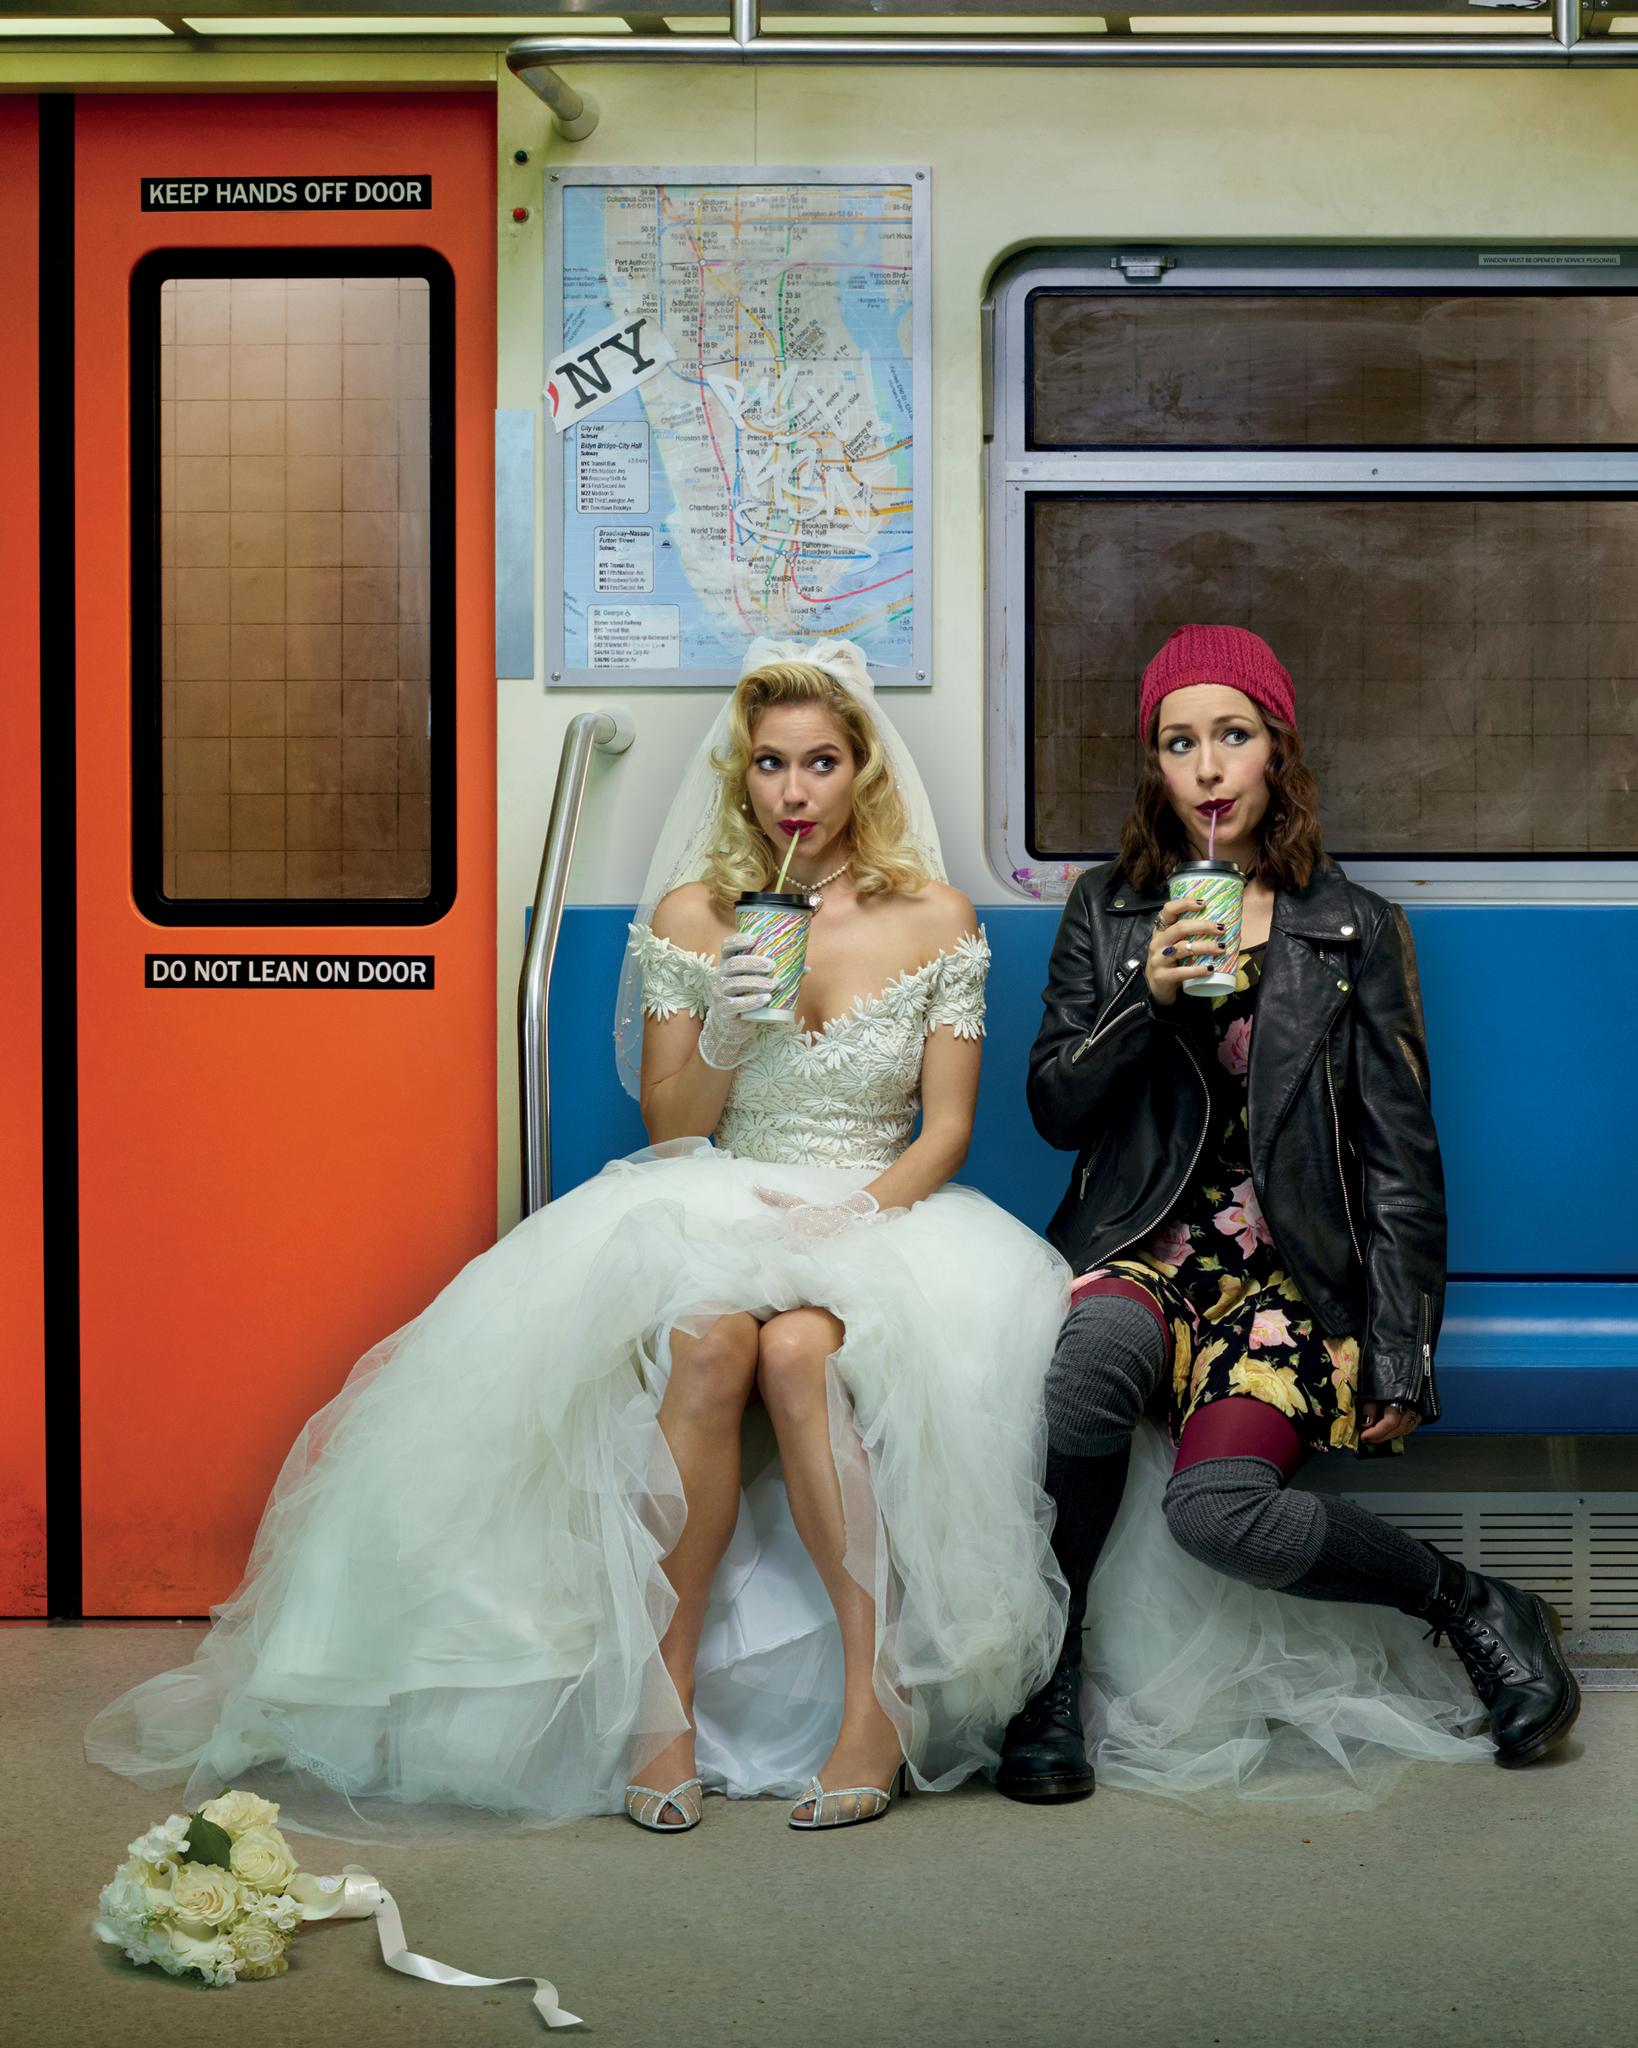 Hindsight (TV Series 2015) - IMDb